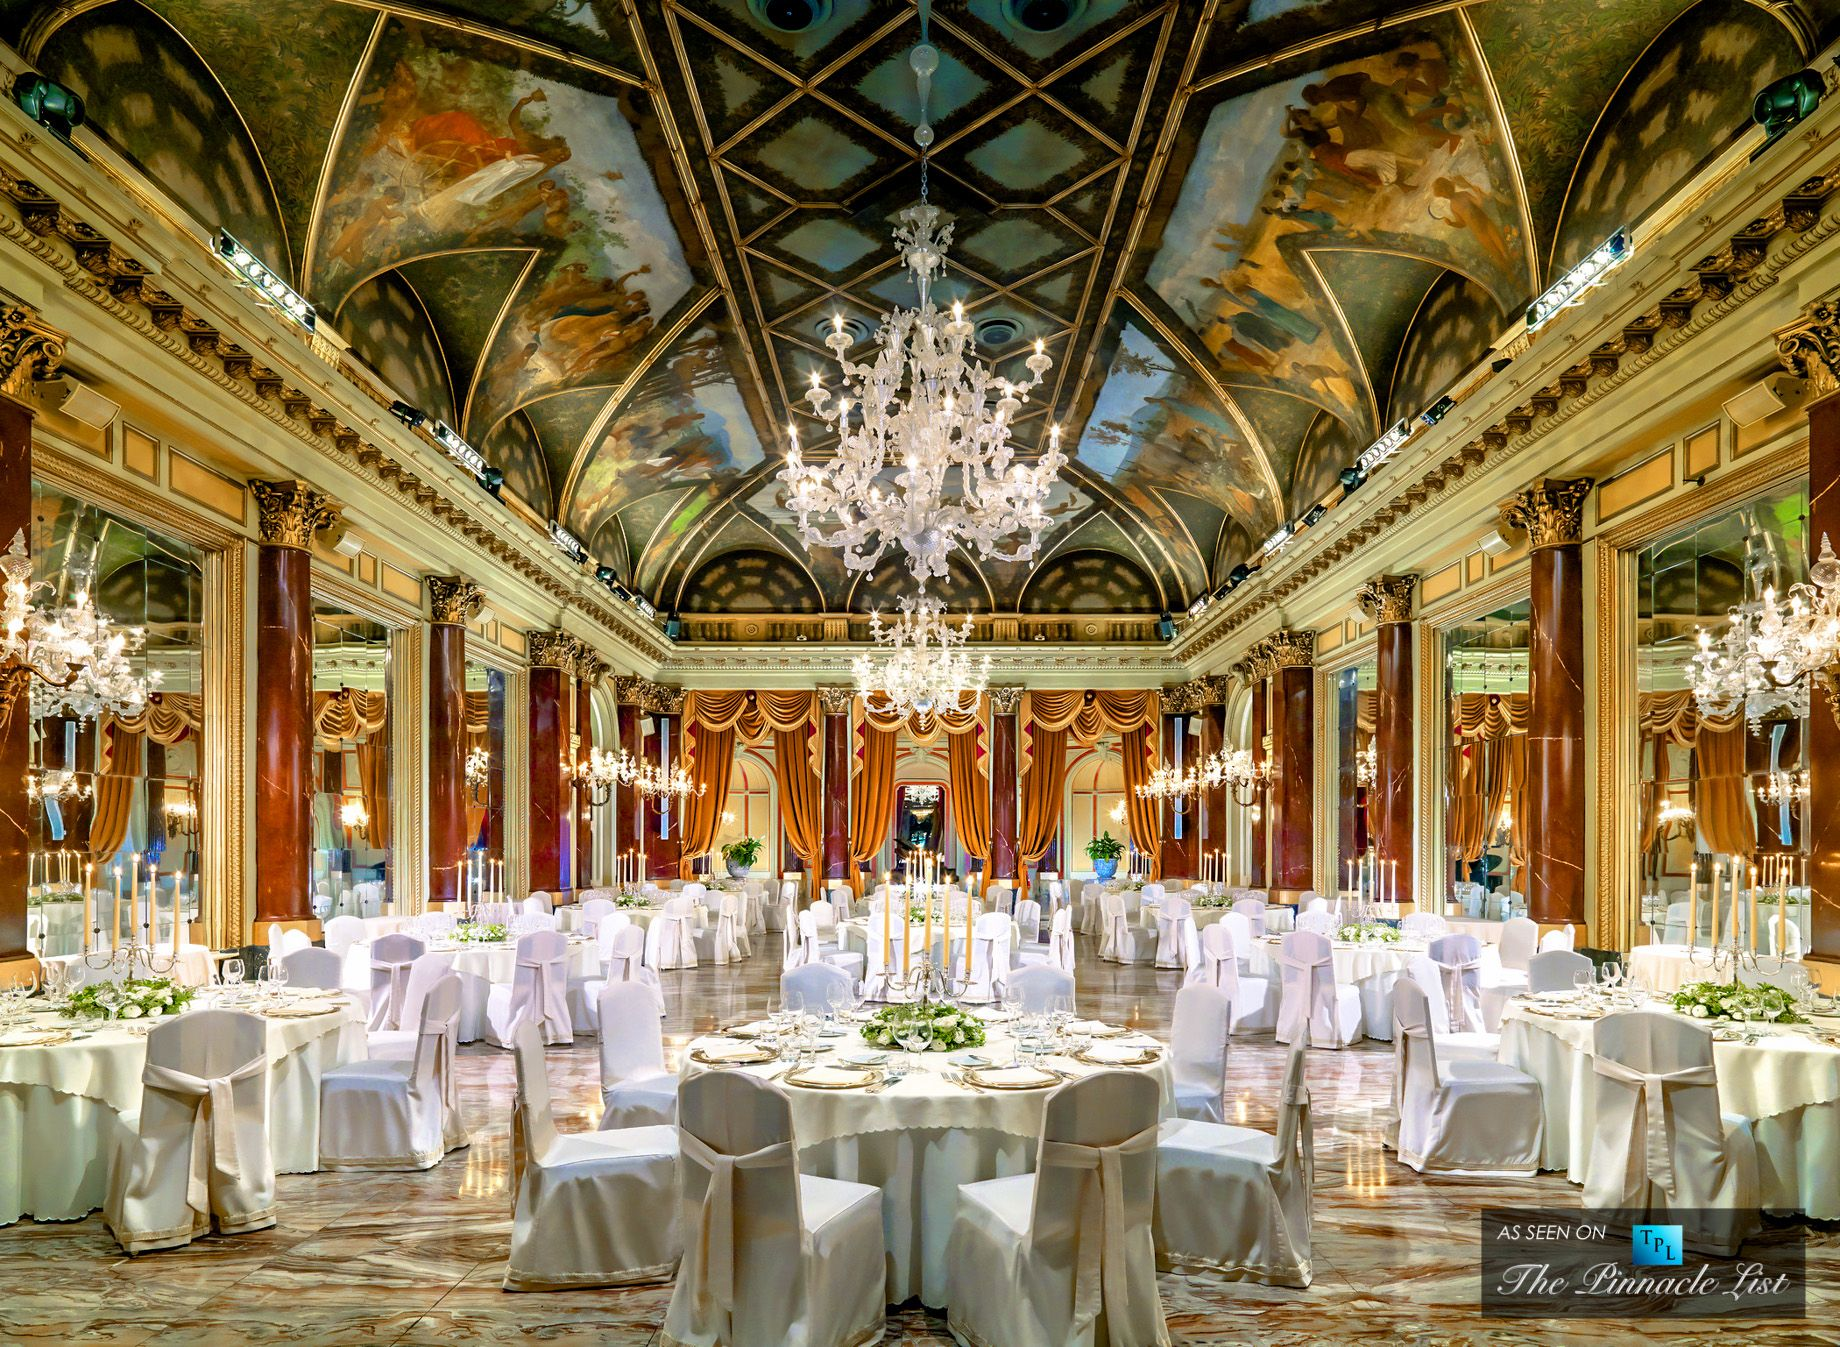 St Regis Luxury Hotel Rome Italy Ritz Ballroom Gala Dinner